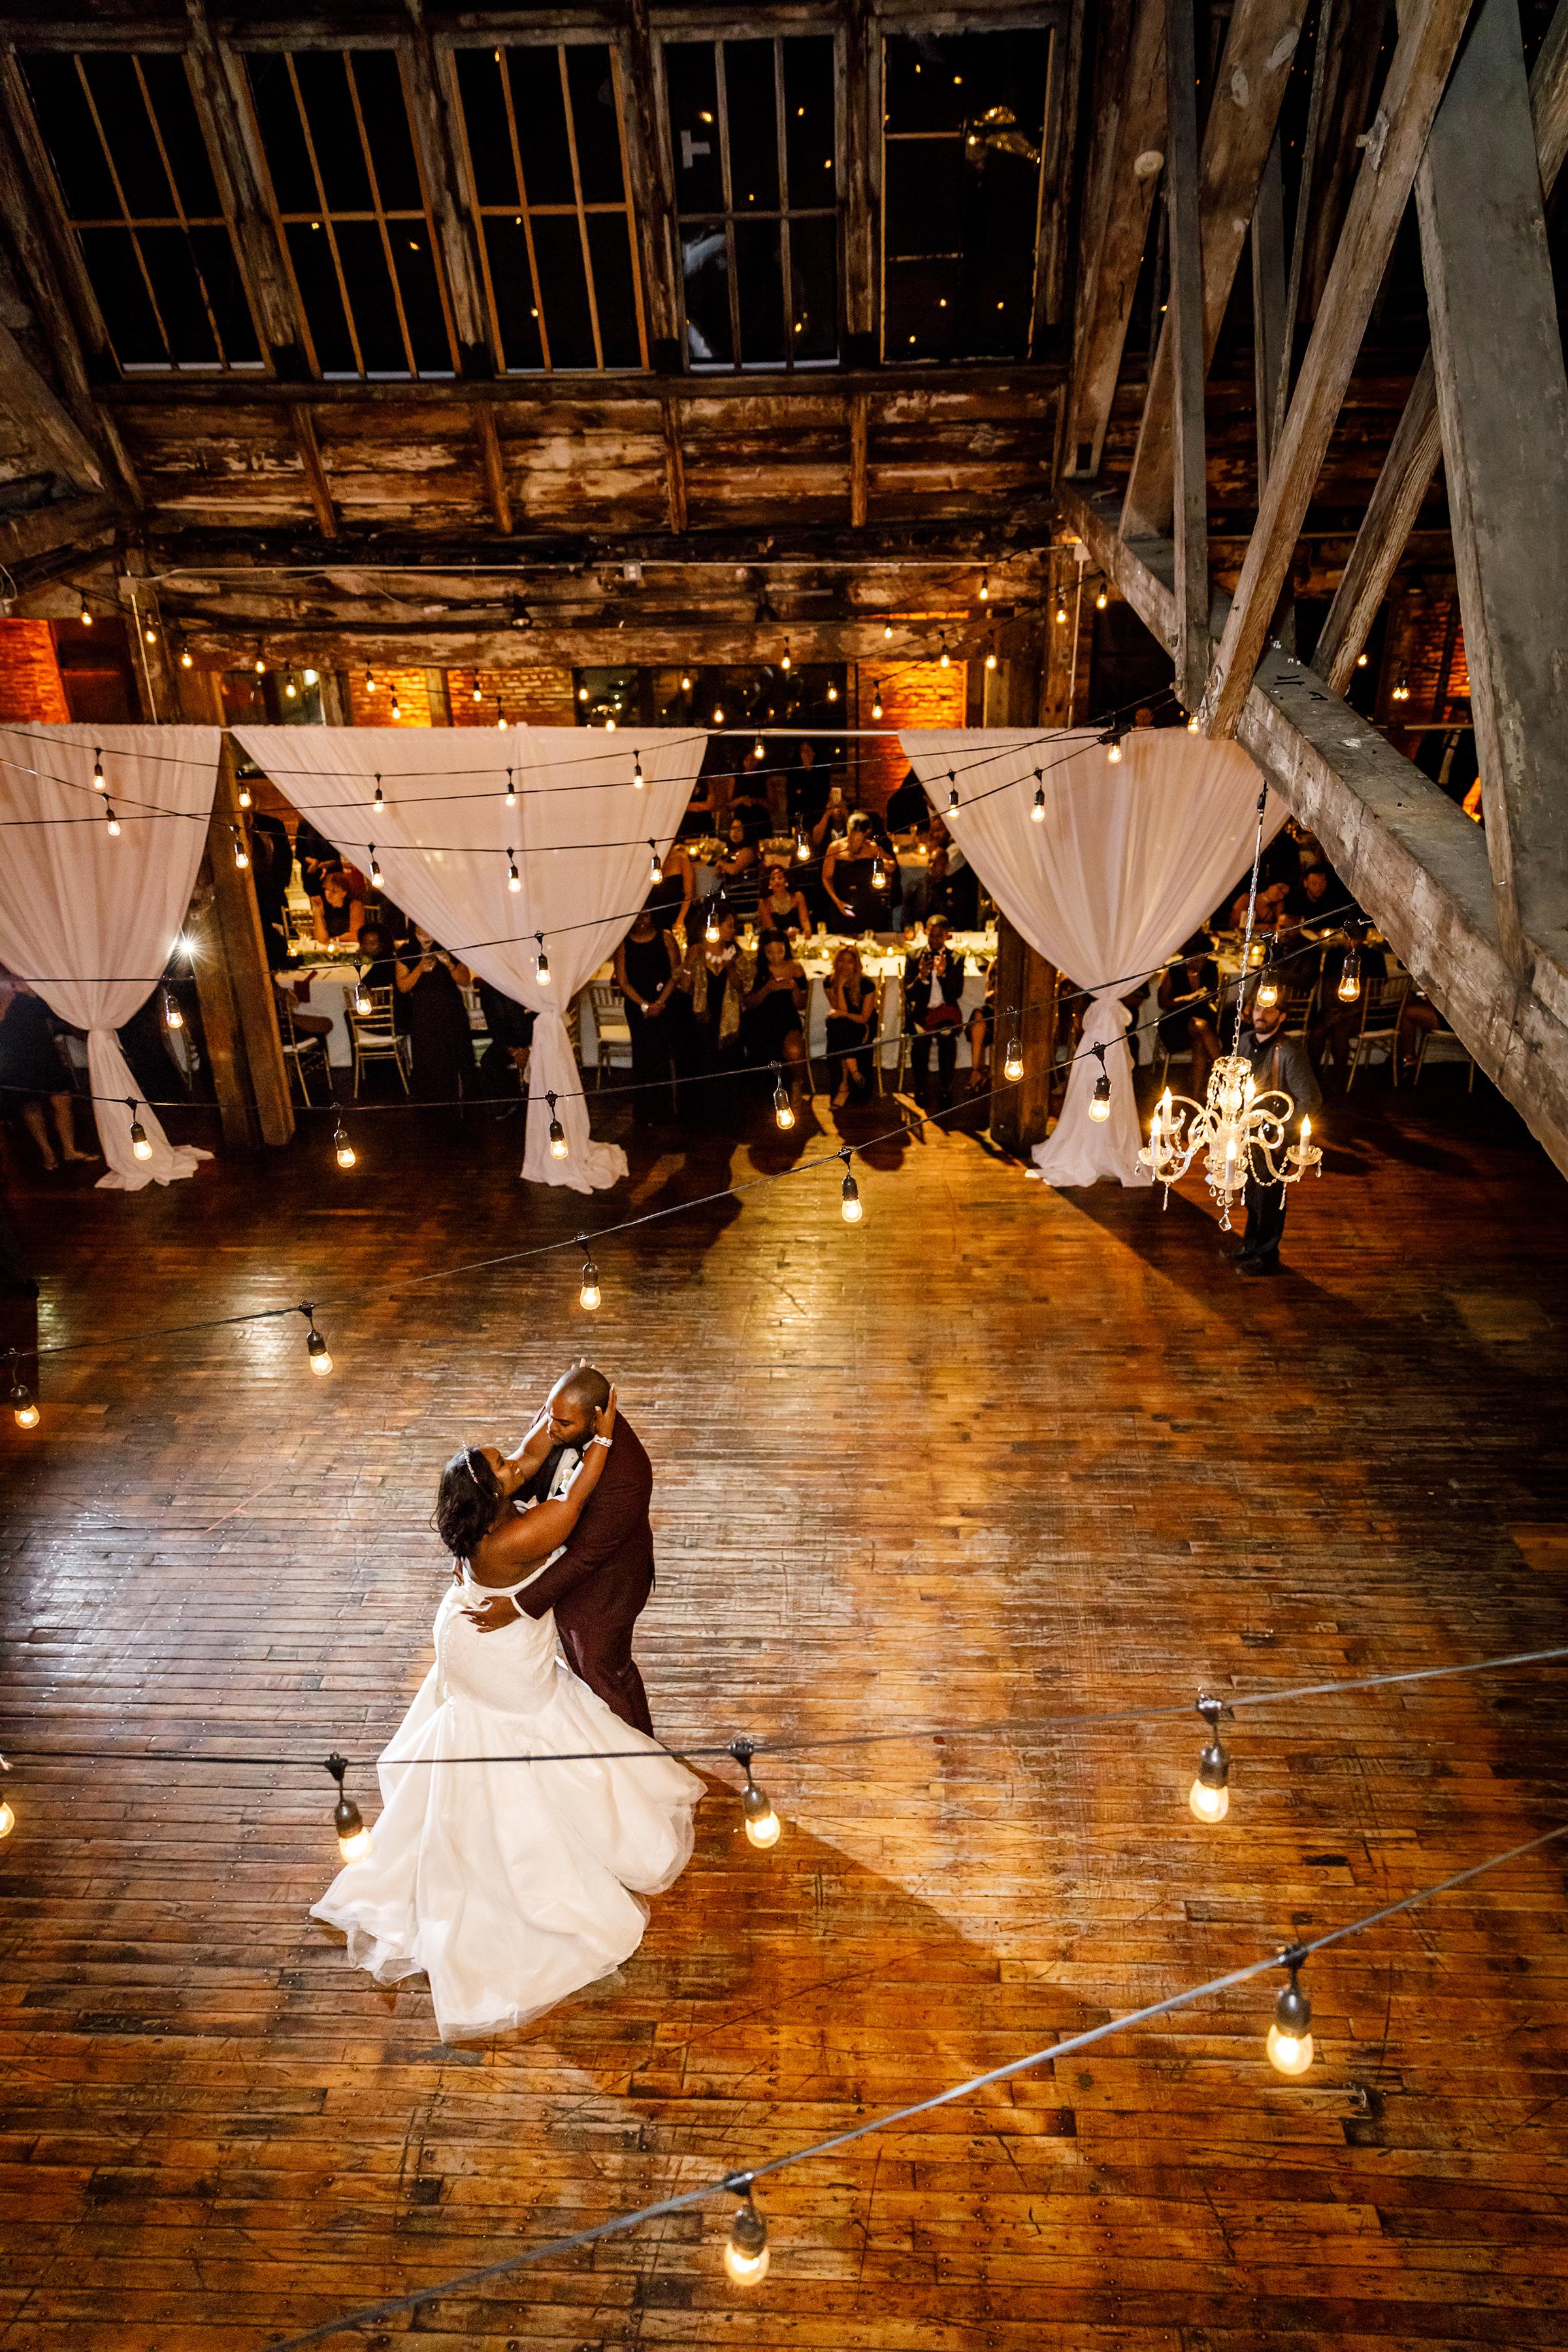 victorious-events-nyc-042-yanique-rondel-greenpoint-loft-wedding-amy-anaiz.jpg